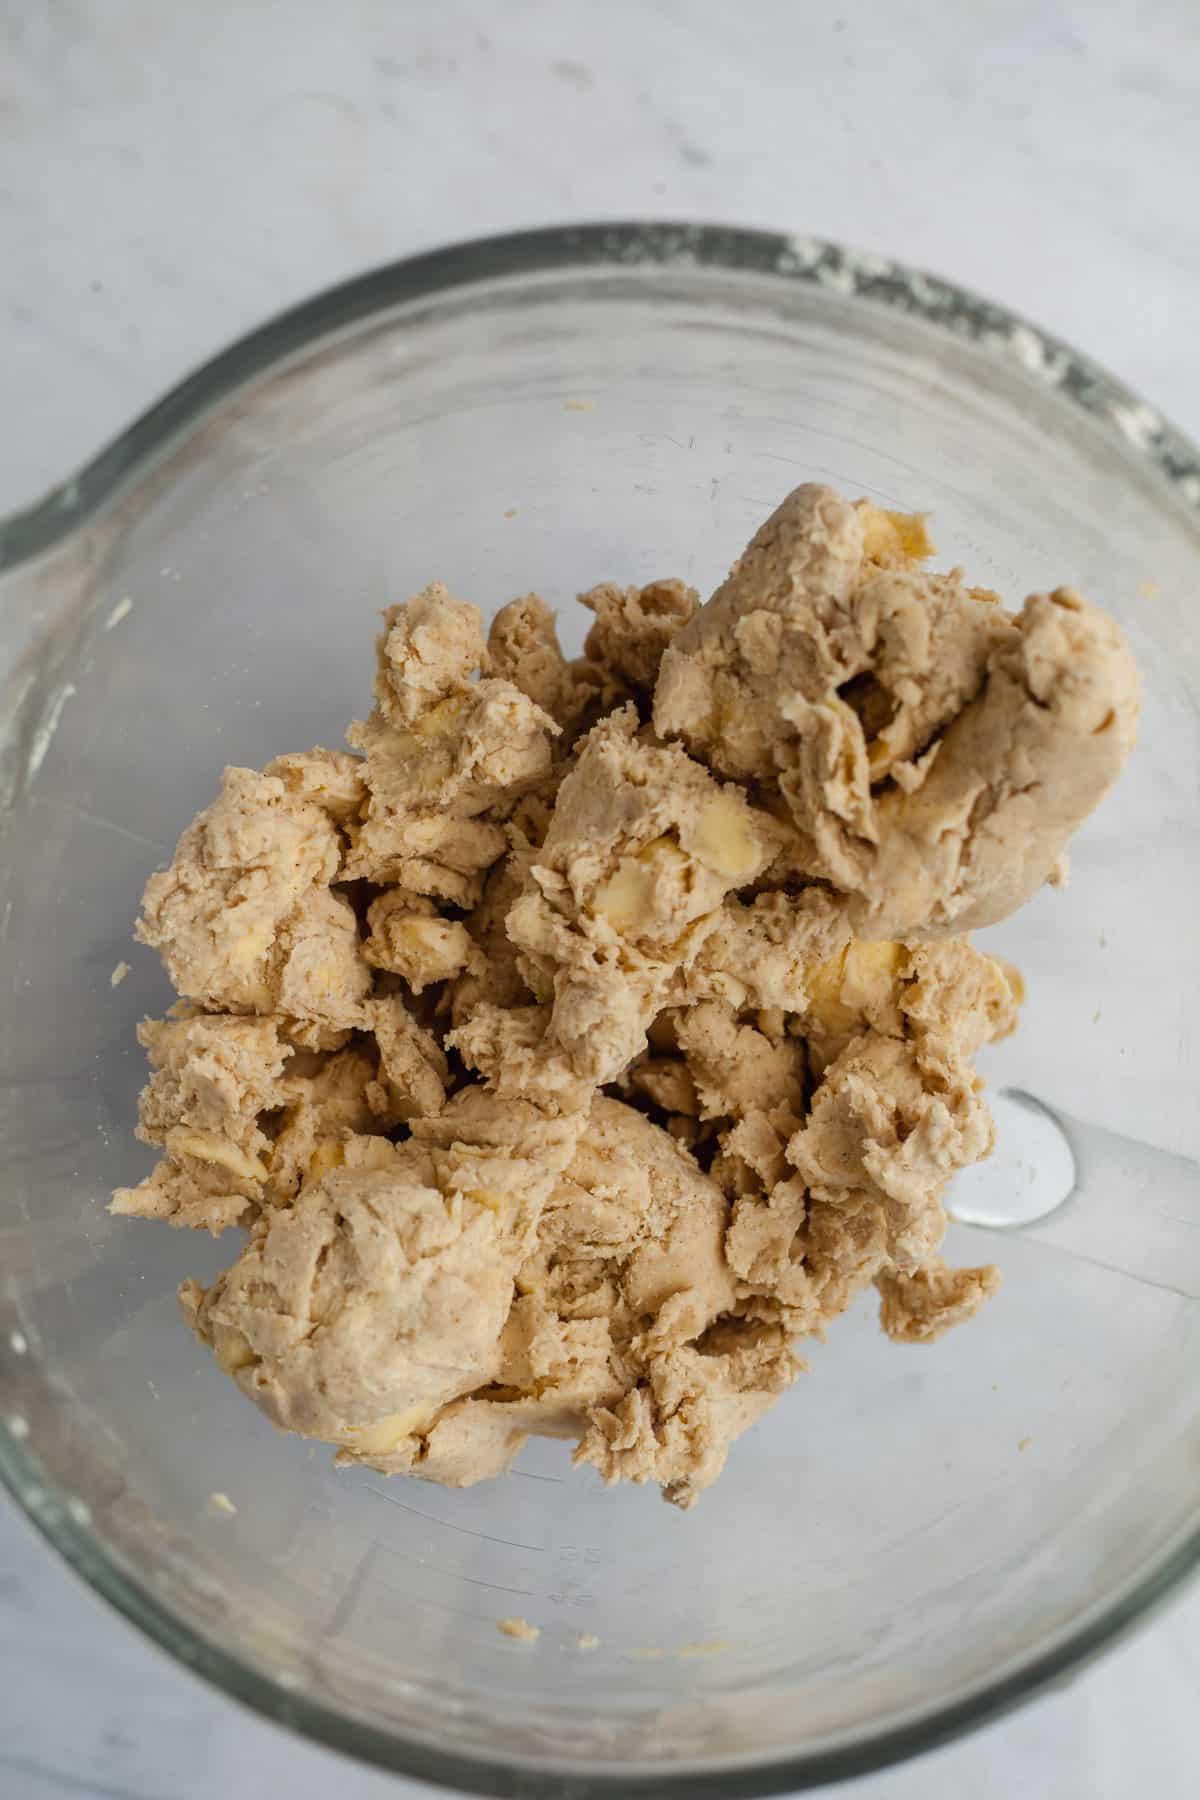 cinnamon pie dough in a bowl